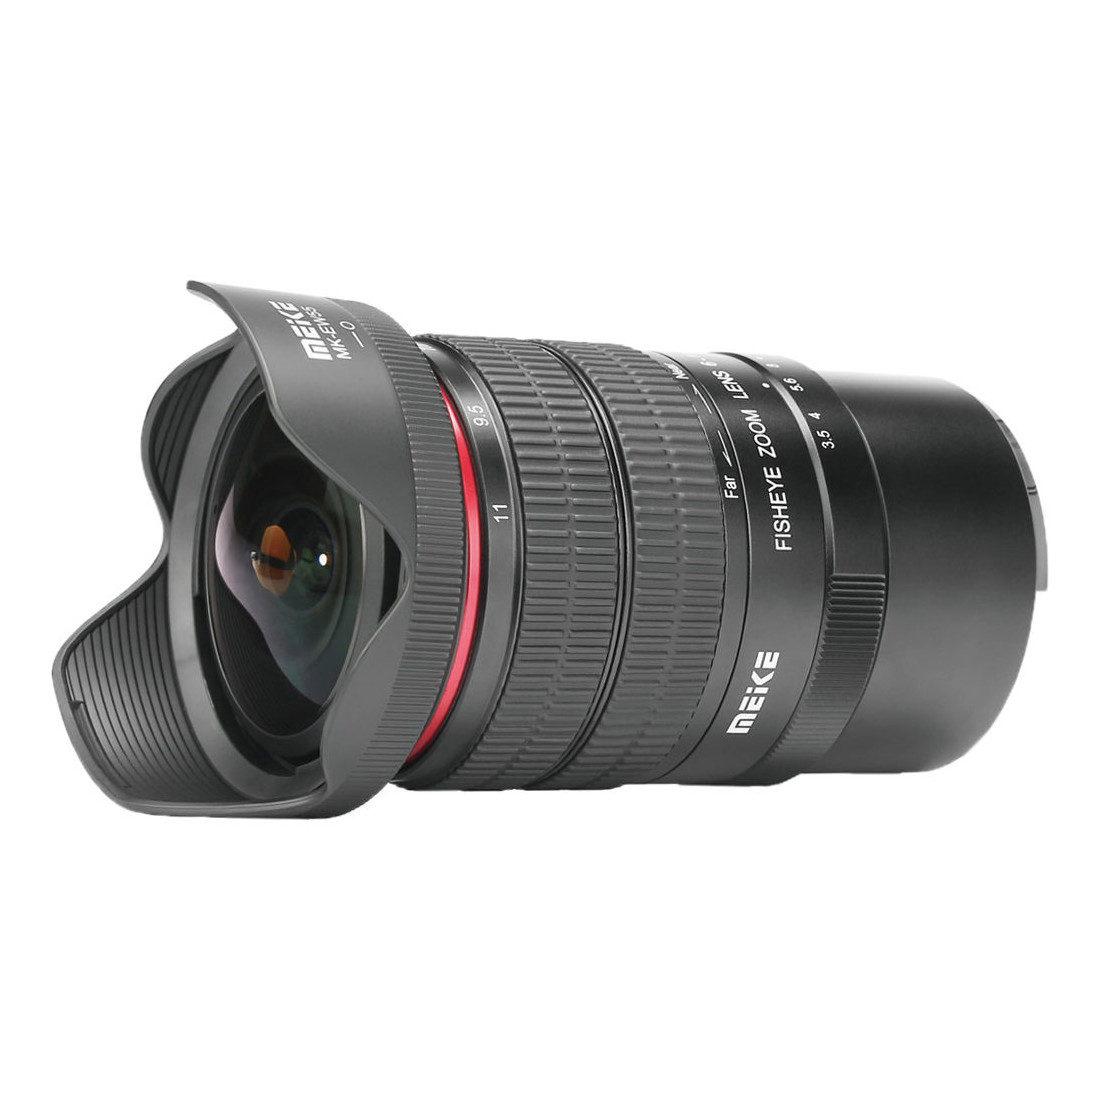 Meike MK-6-11mm f/3.5 Fisheye Canon EF-M objectief met korting